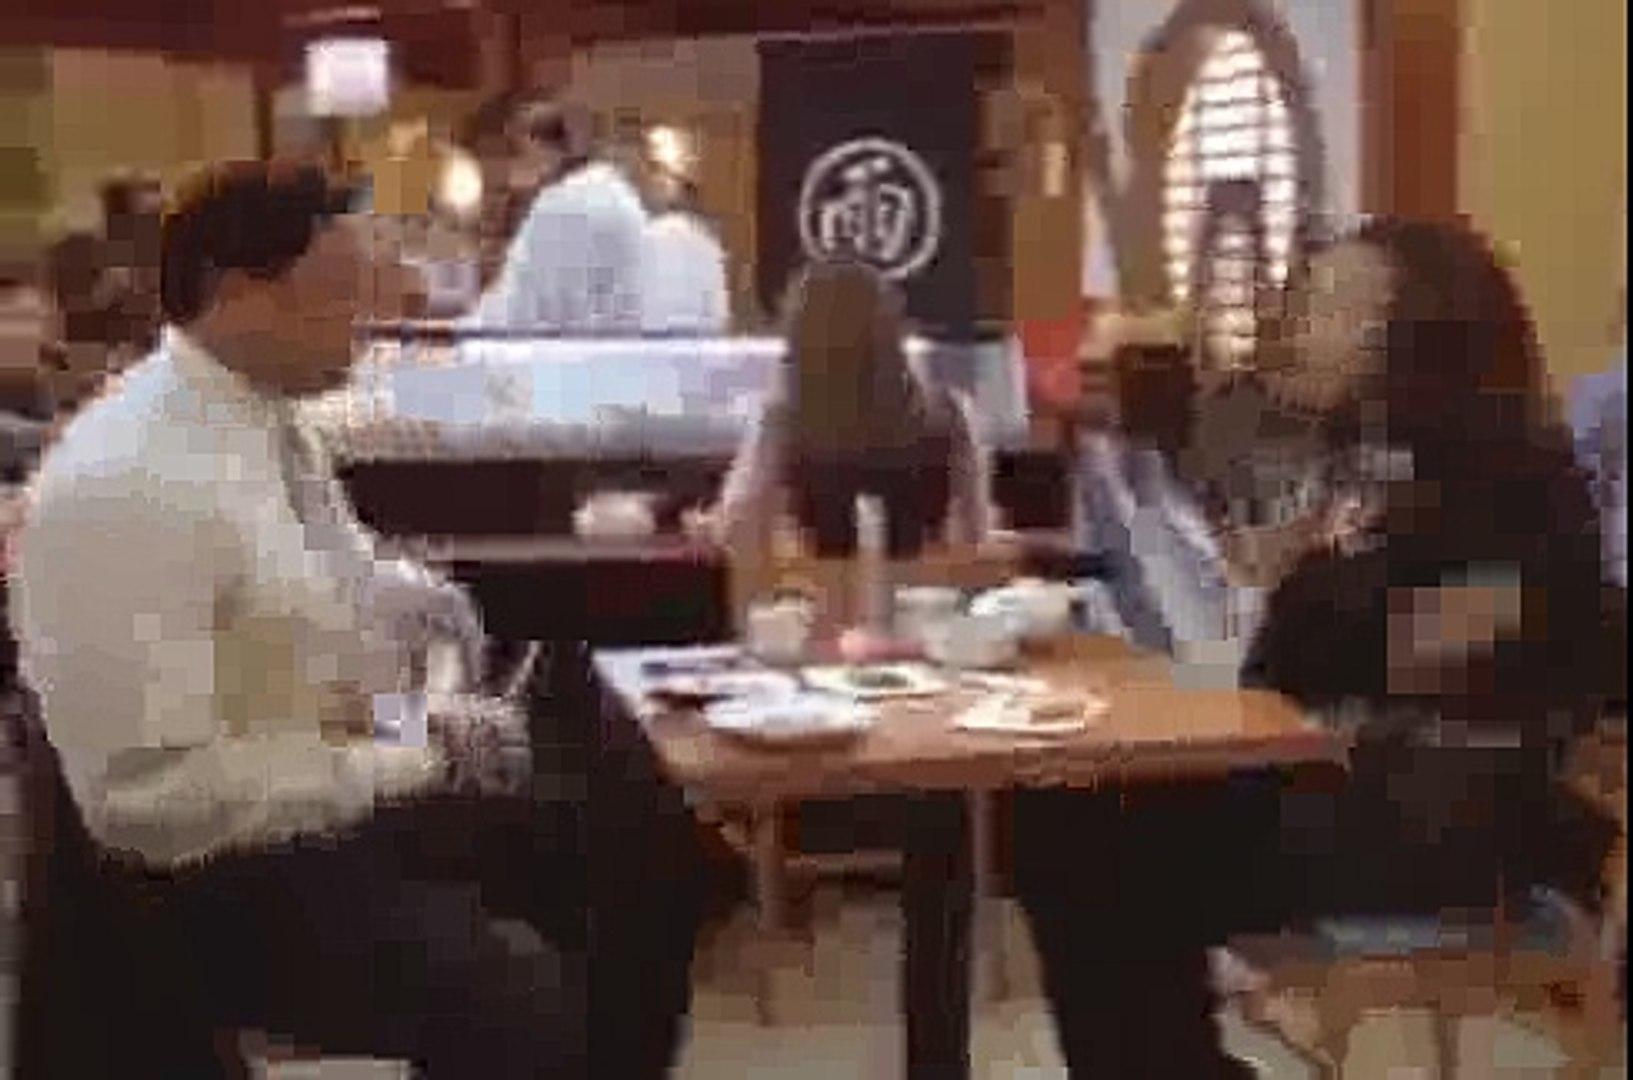 Girlfriends S02 Ep19 X Does Not Mark the Spot_2 by GirlfriendsTv